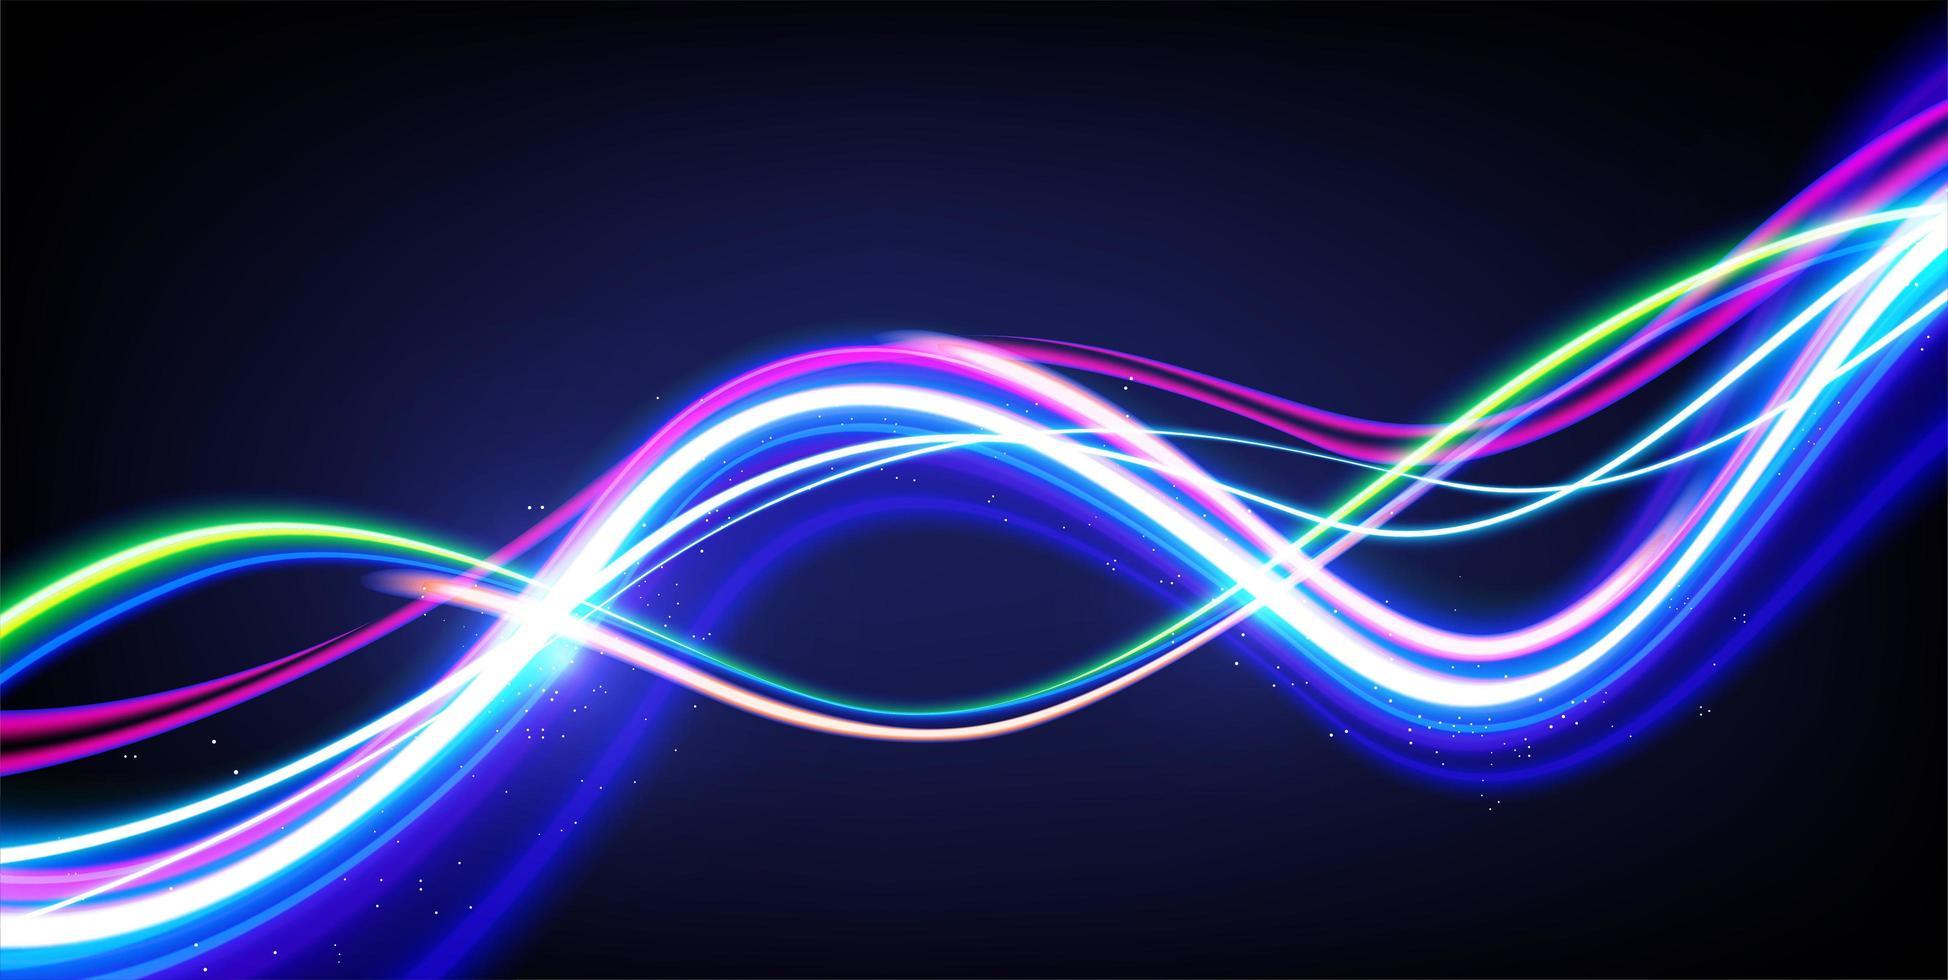 langzame sluiter lichtgolven ontwerp vector